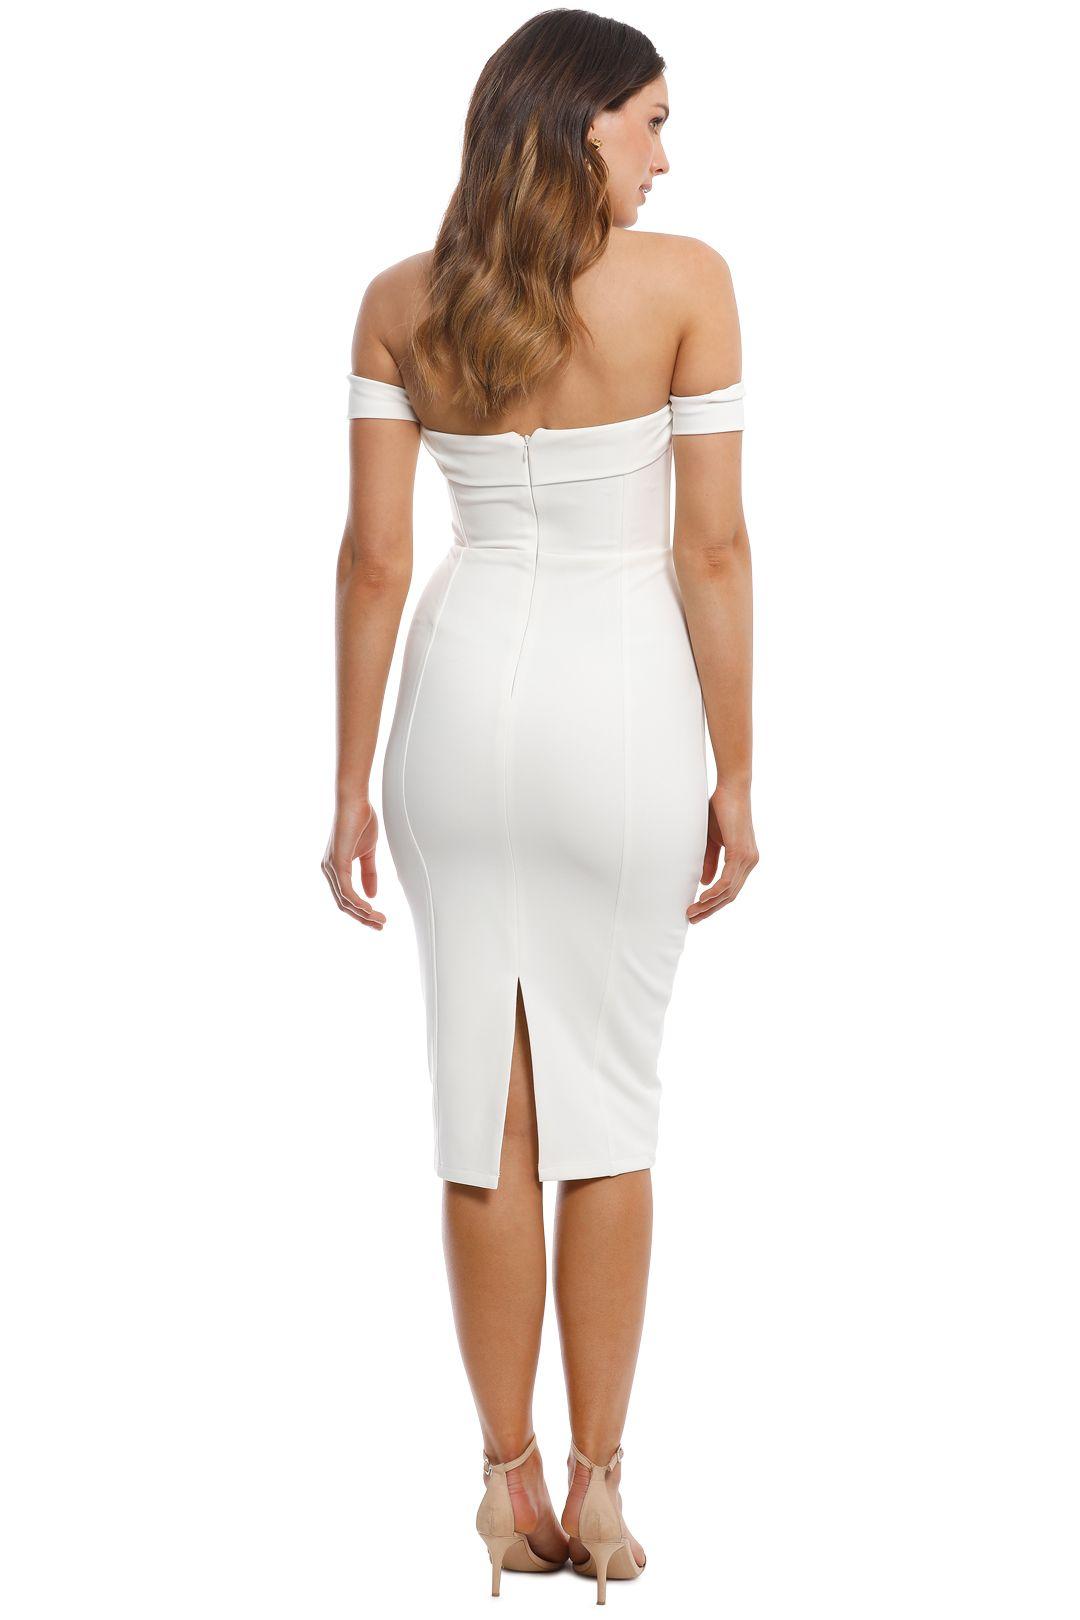 Misha Collection - Chloe Dress - Ivory - Back